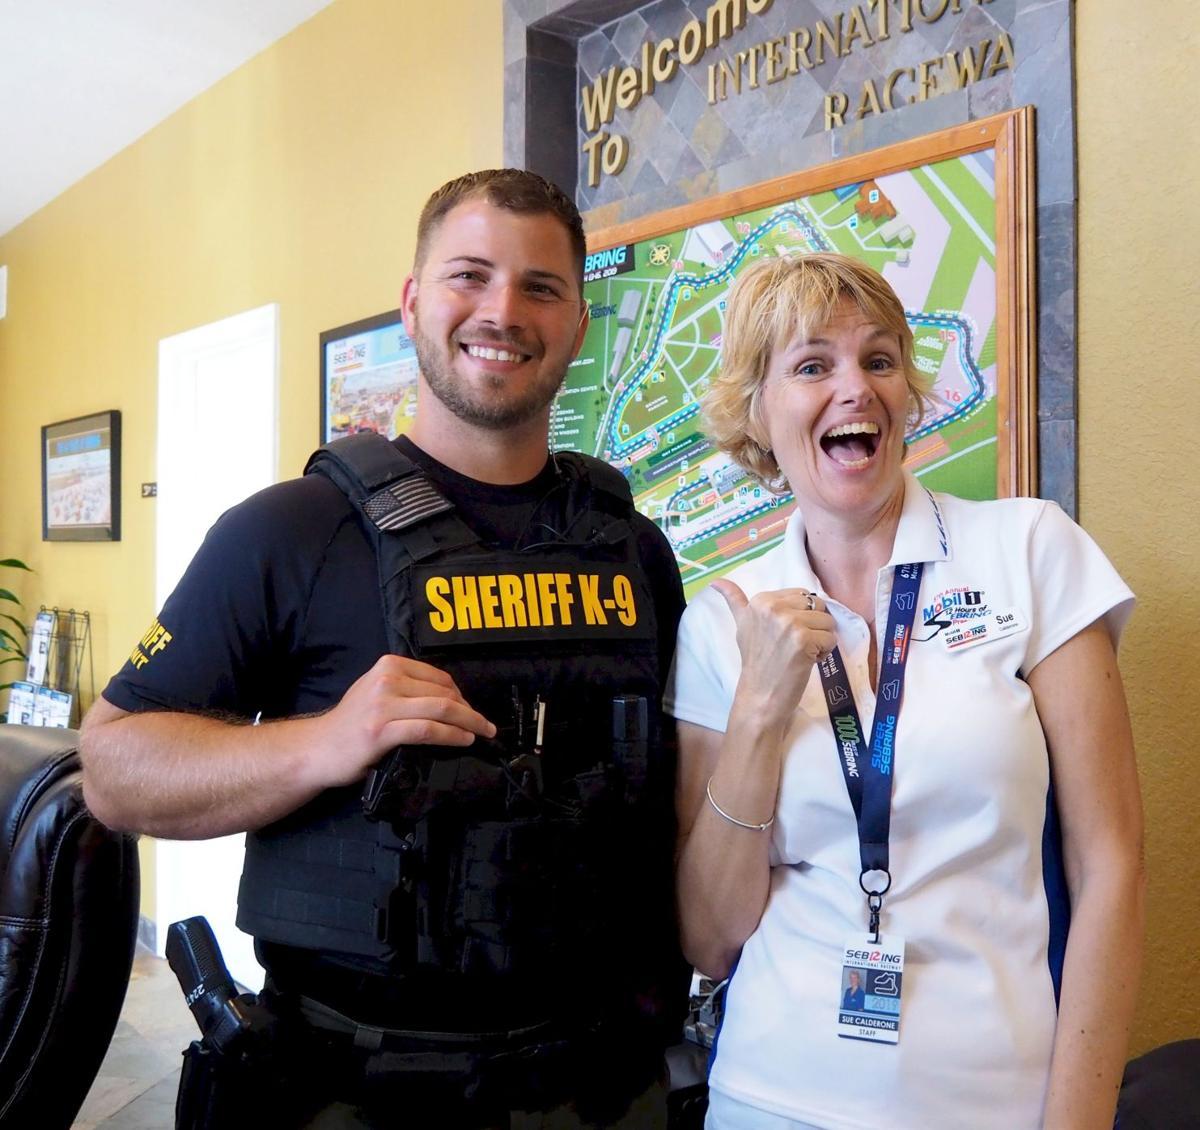 Deputy Ryan O'Gara and Sue Calderone